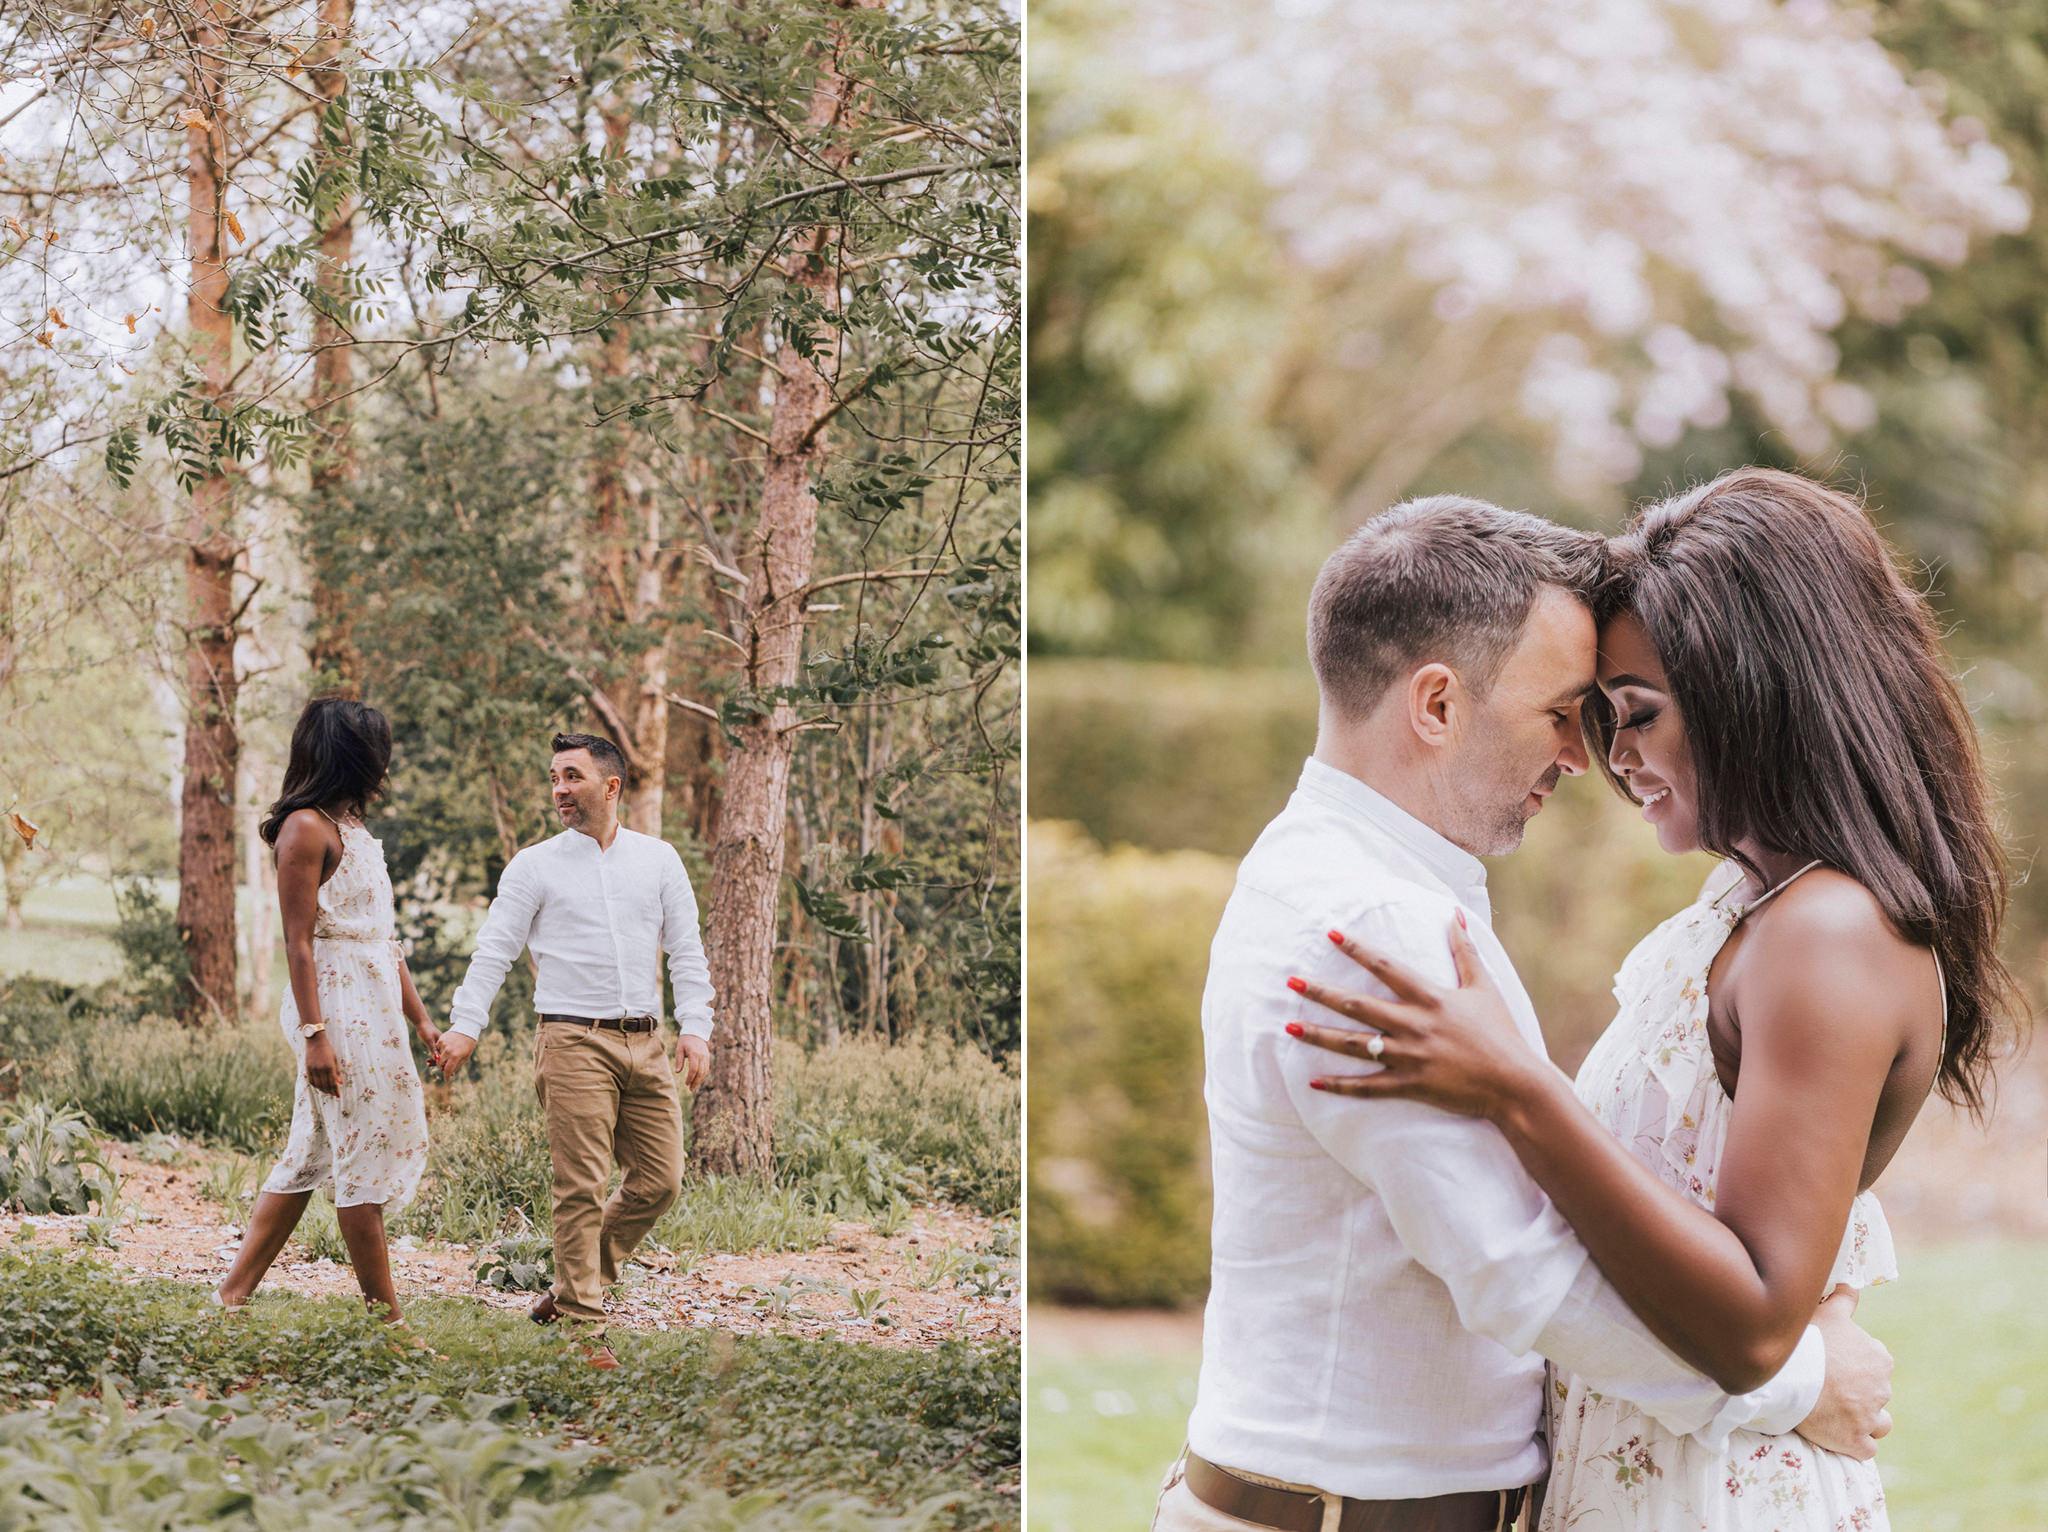 dundee-engagement-wedding-photographer-03.jpg